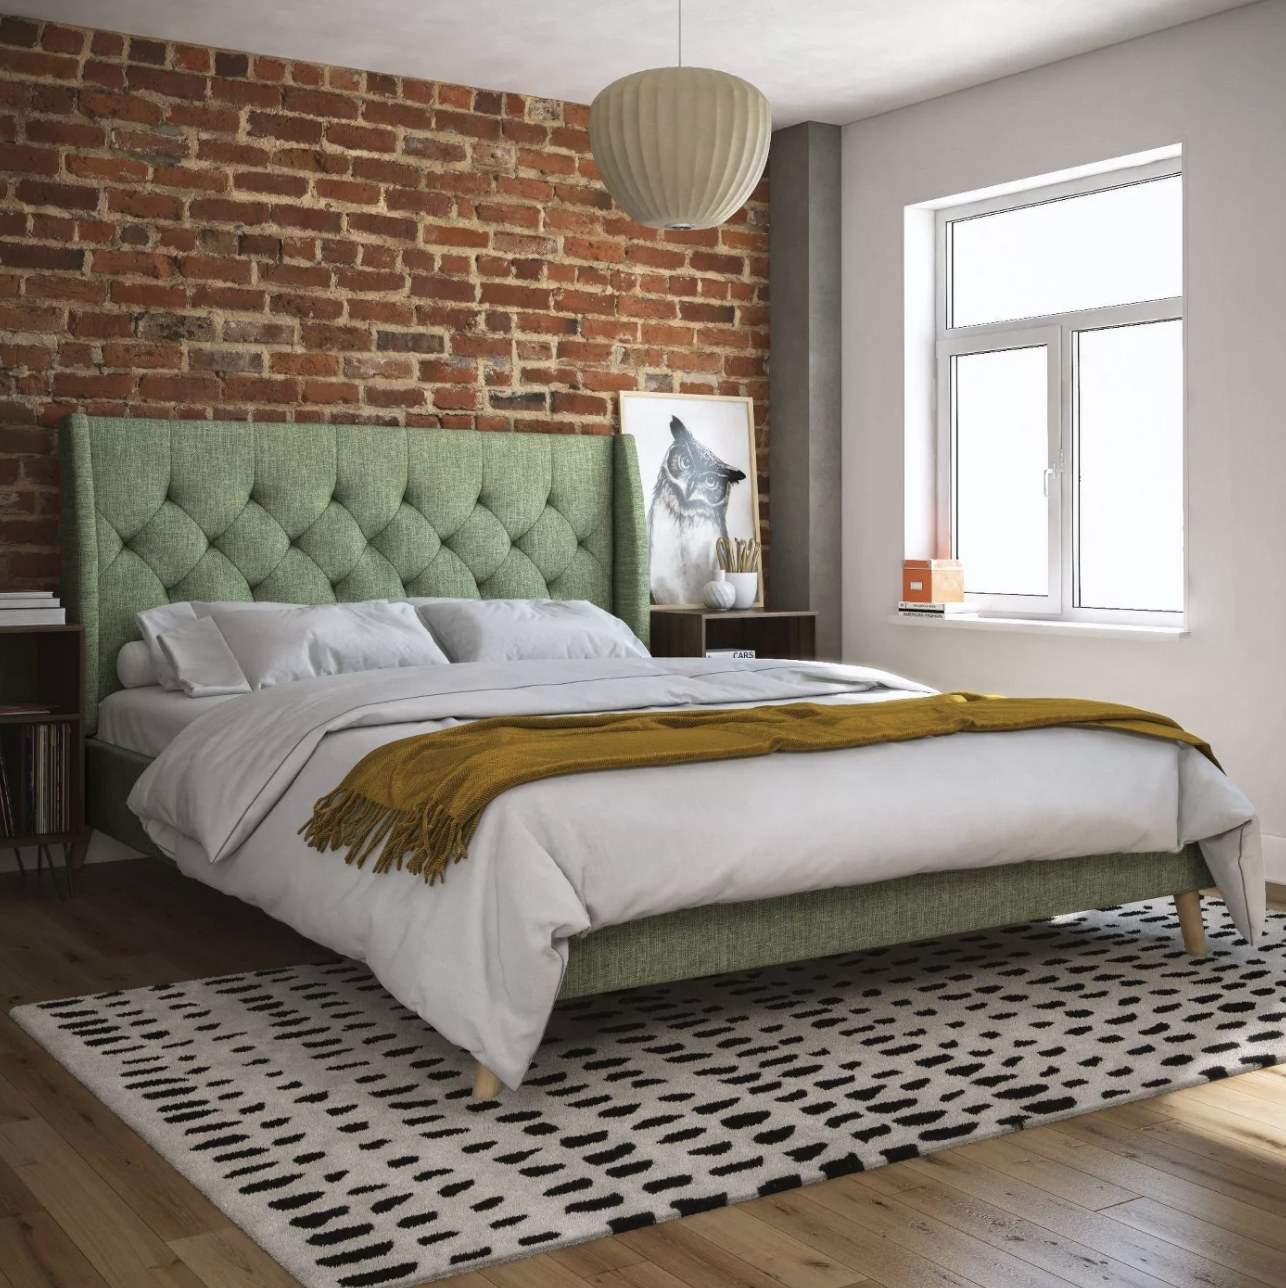 Upholstered bed in bedroom.